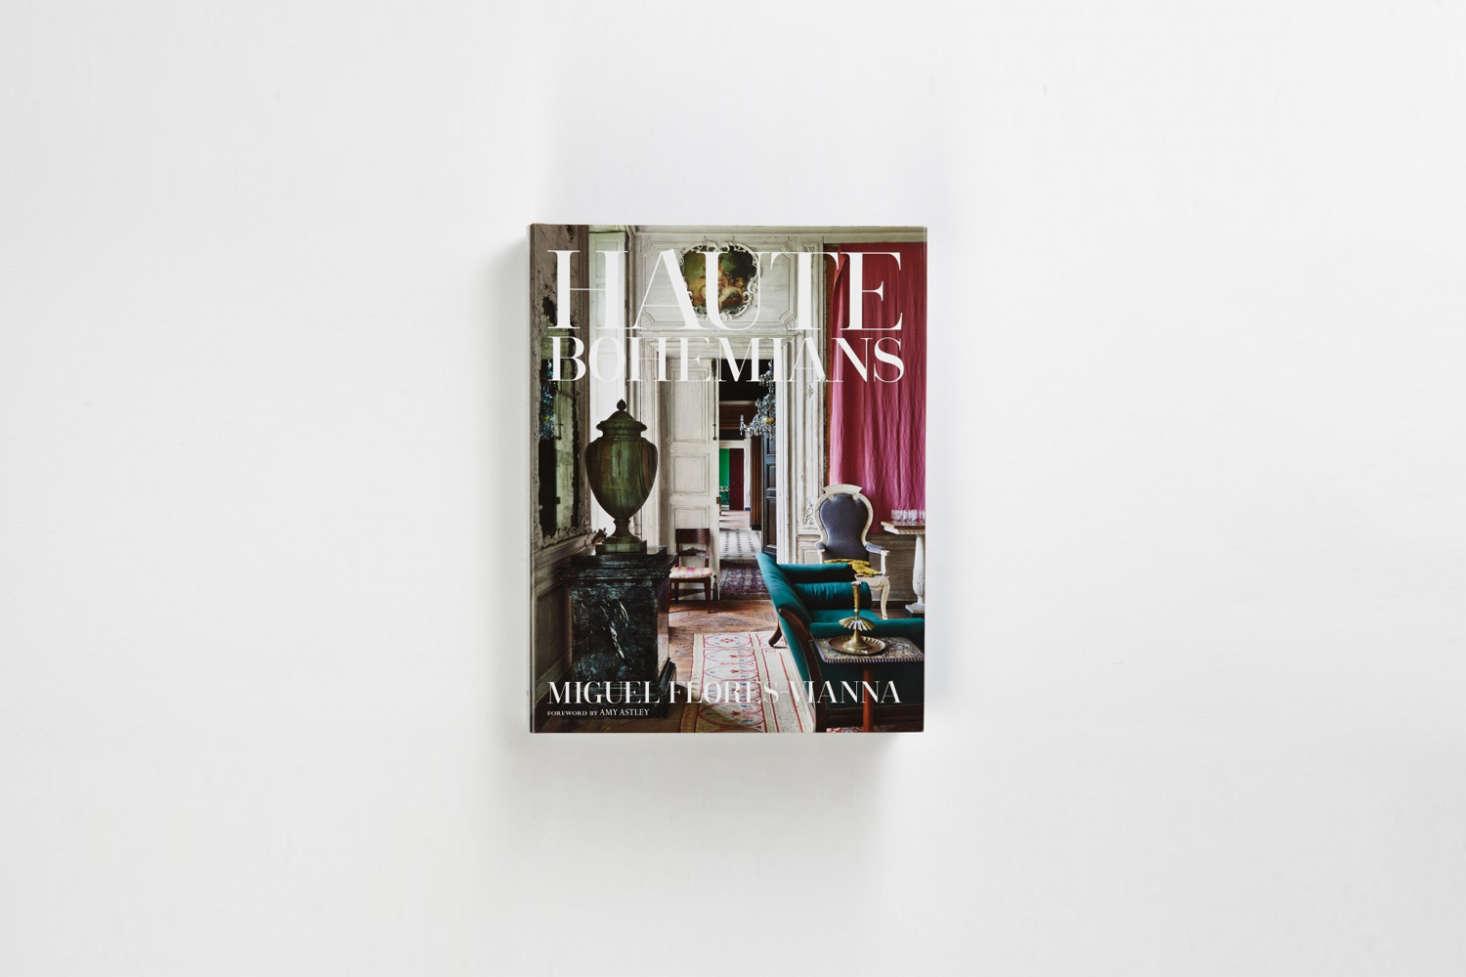 The lushly photographedHaute Bohemians by Miguel Flores Vianna is $40.4src=